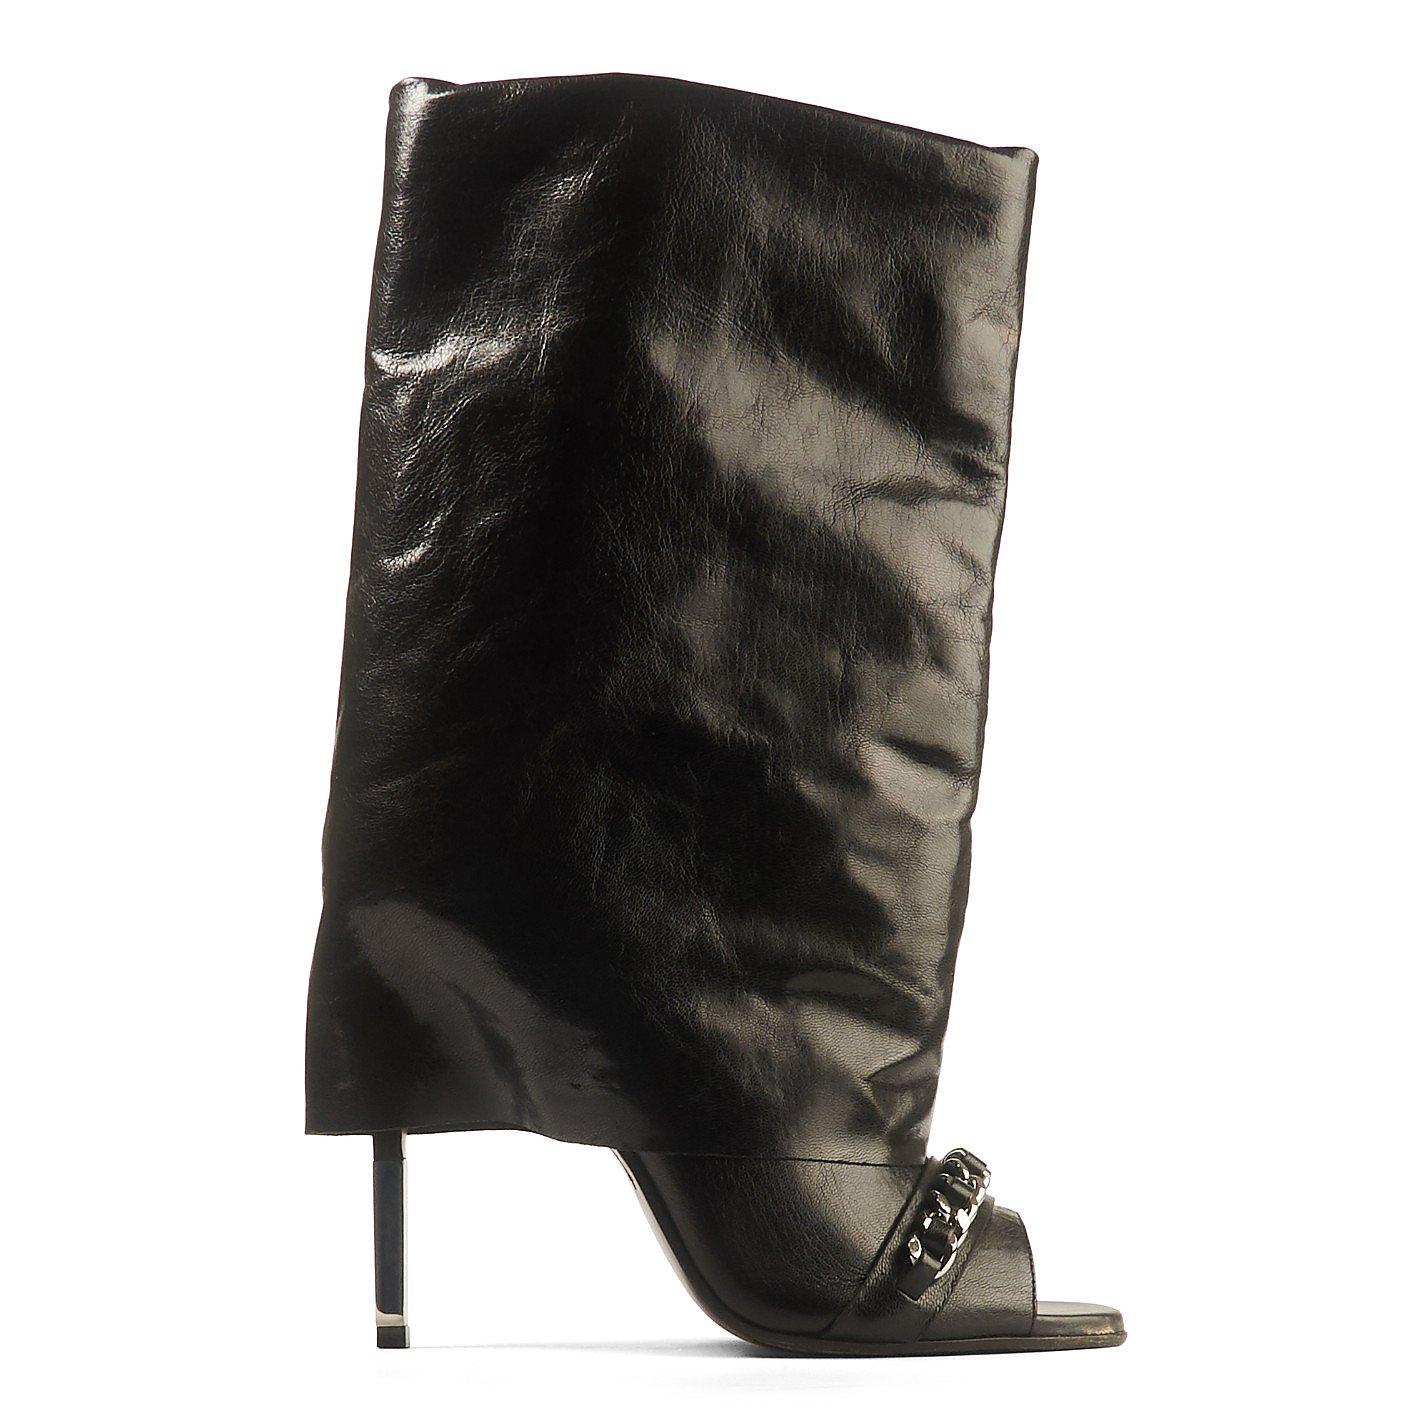 Balmain Leather Open Toe Boots